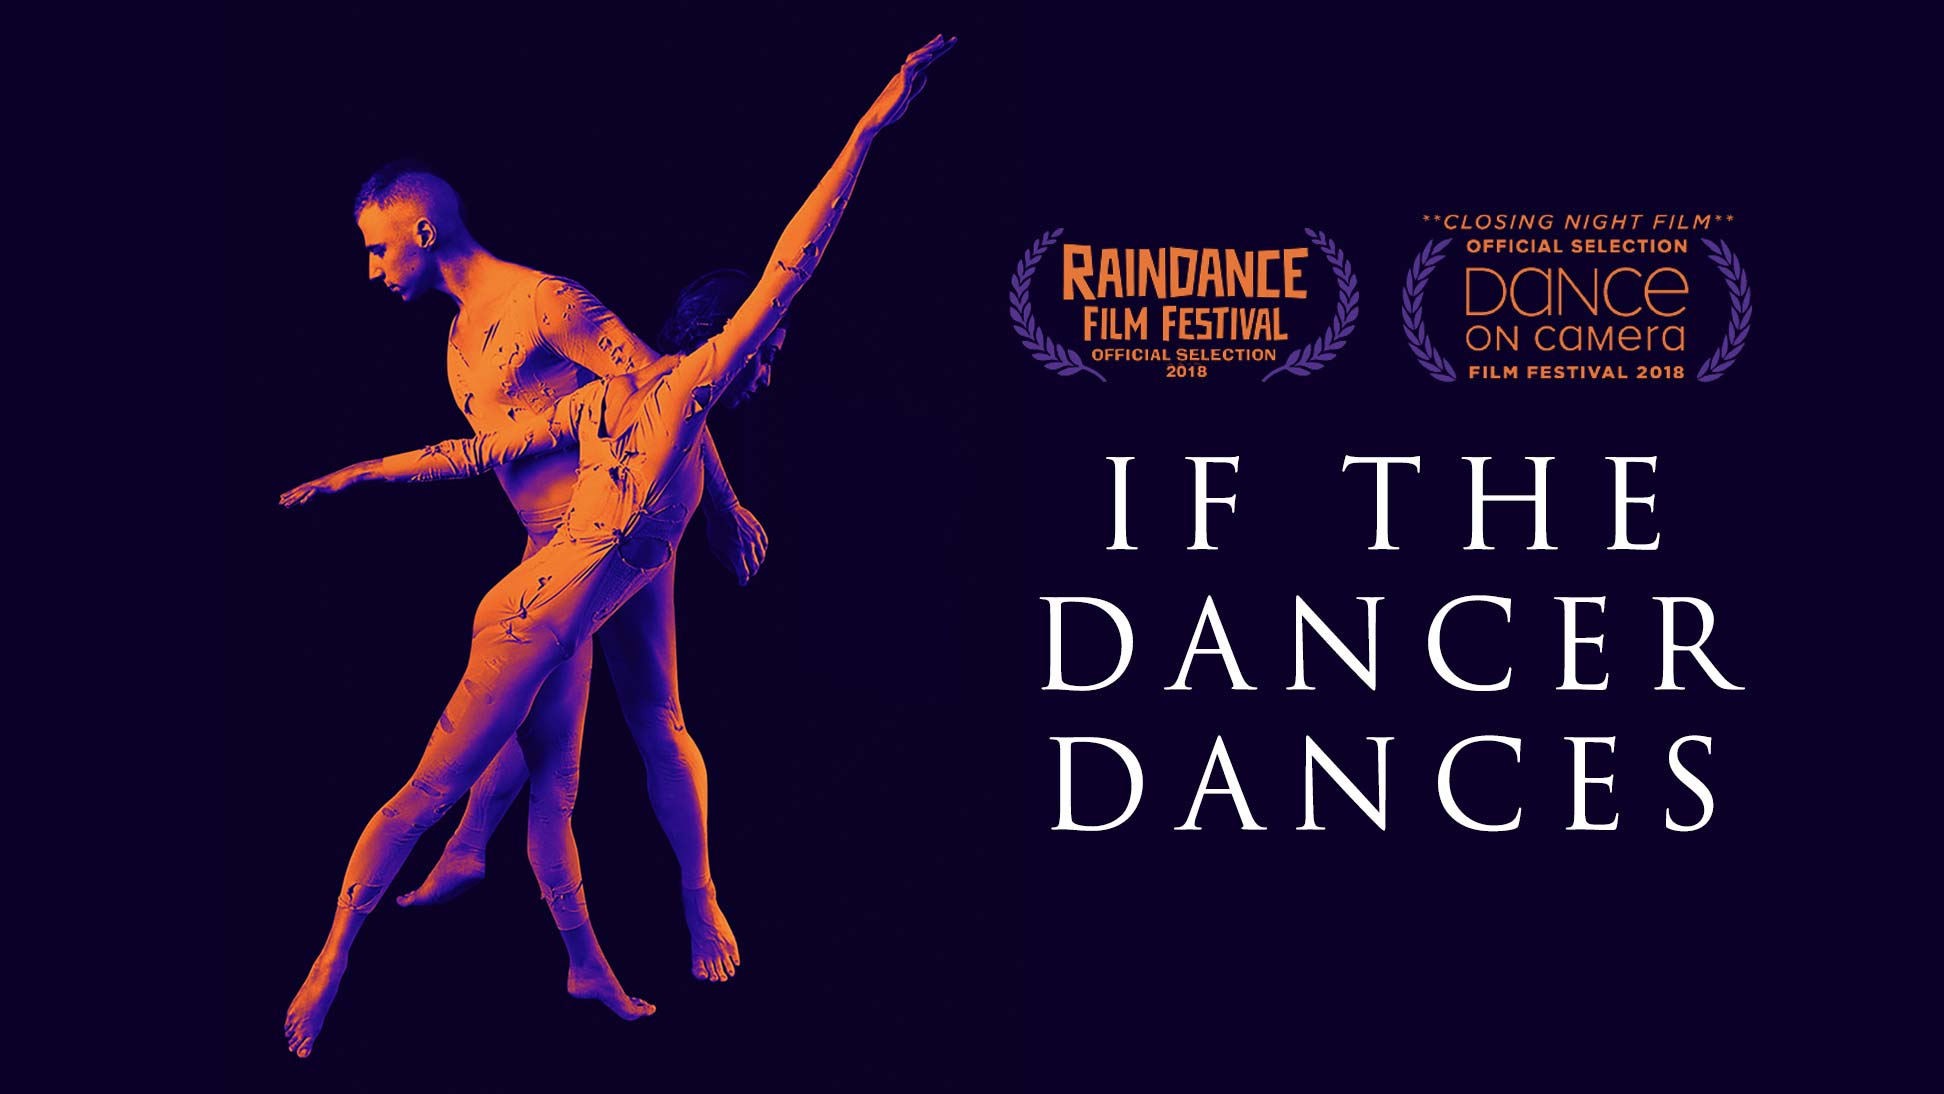 If The Dancer Dances - image